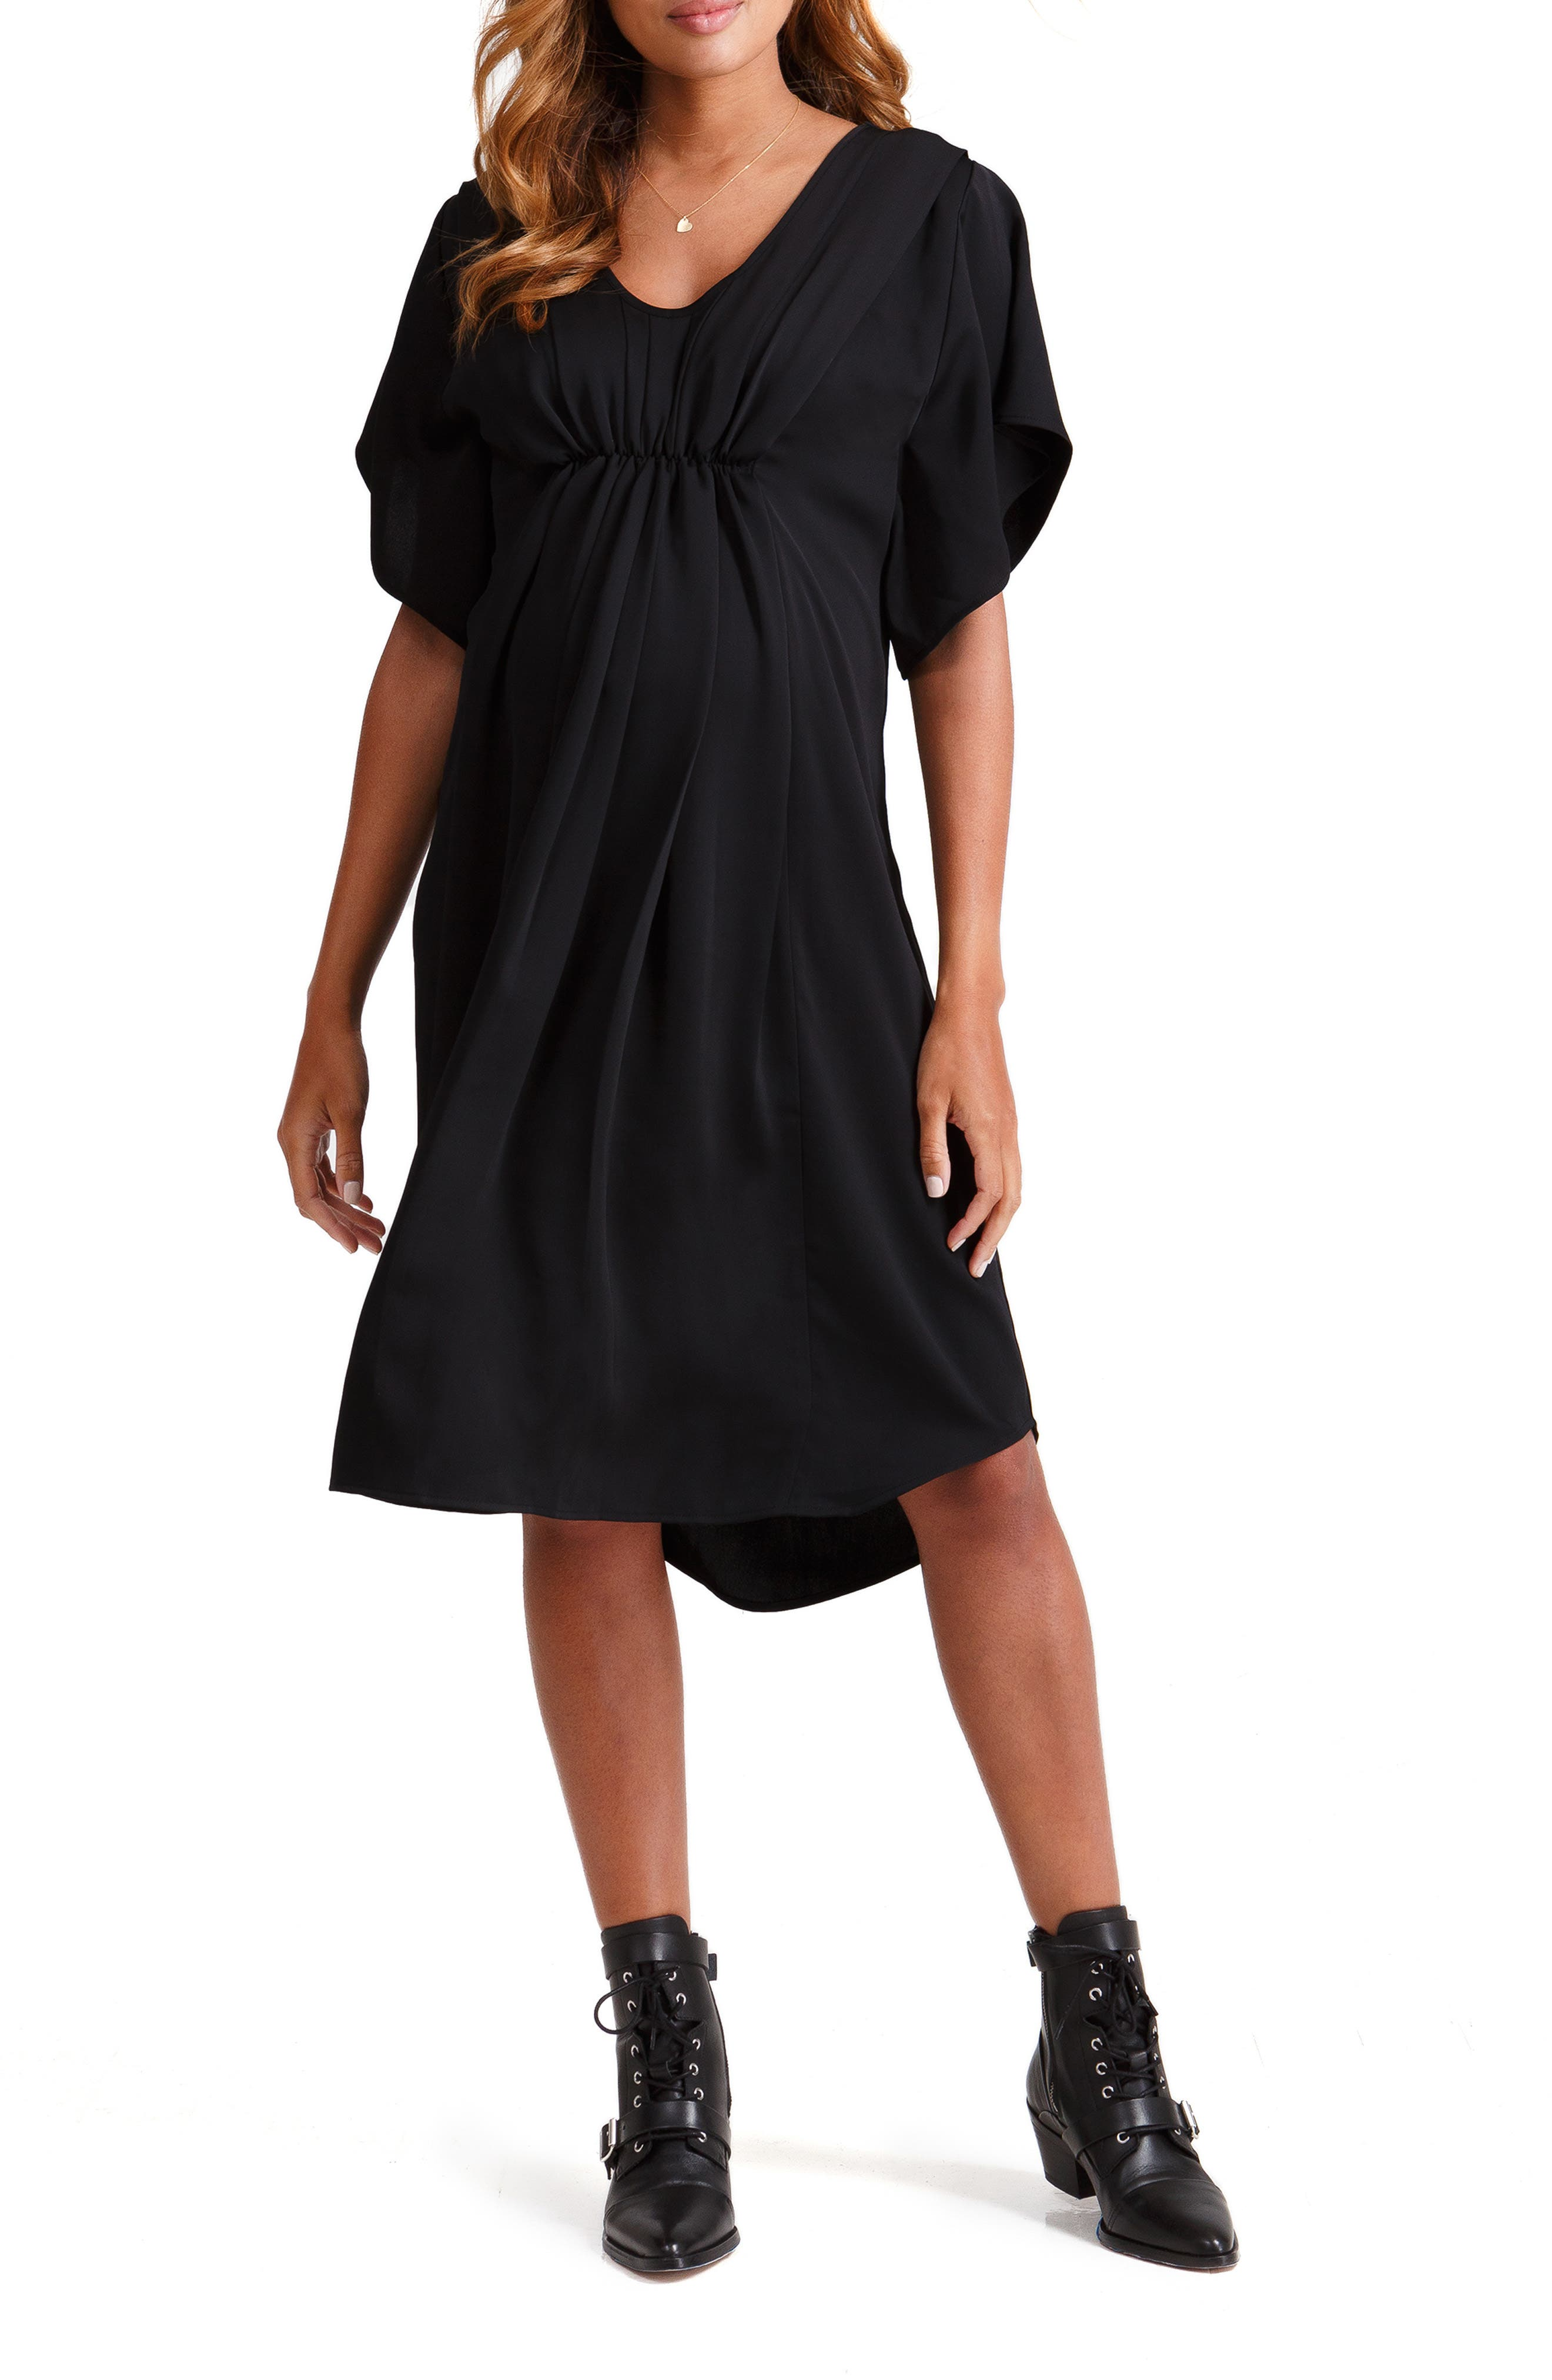 Ingrid & Isabel Pleat Front Maternity/nursing Dress, Black